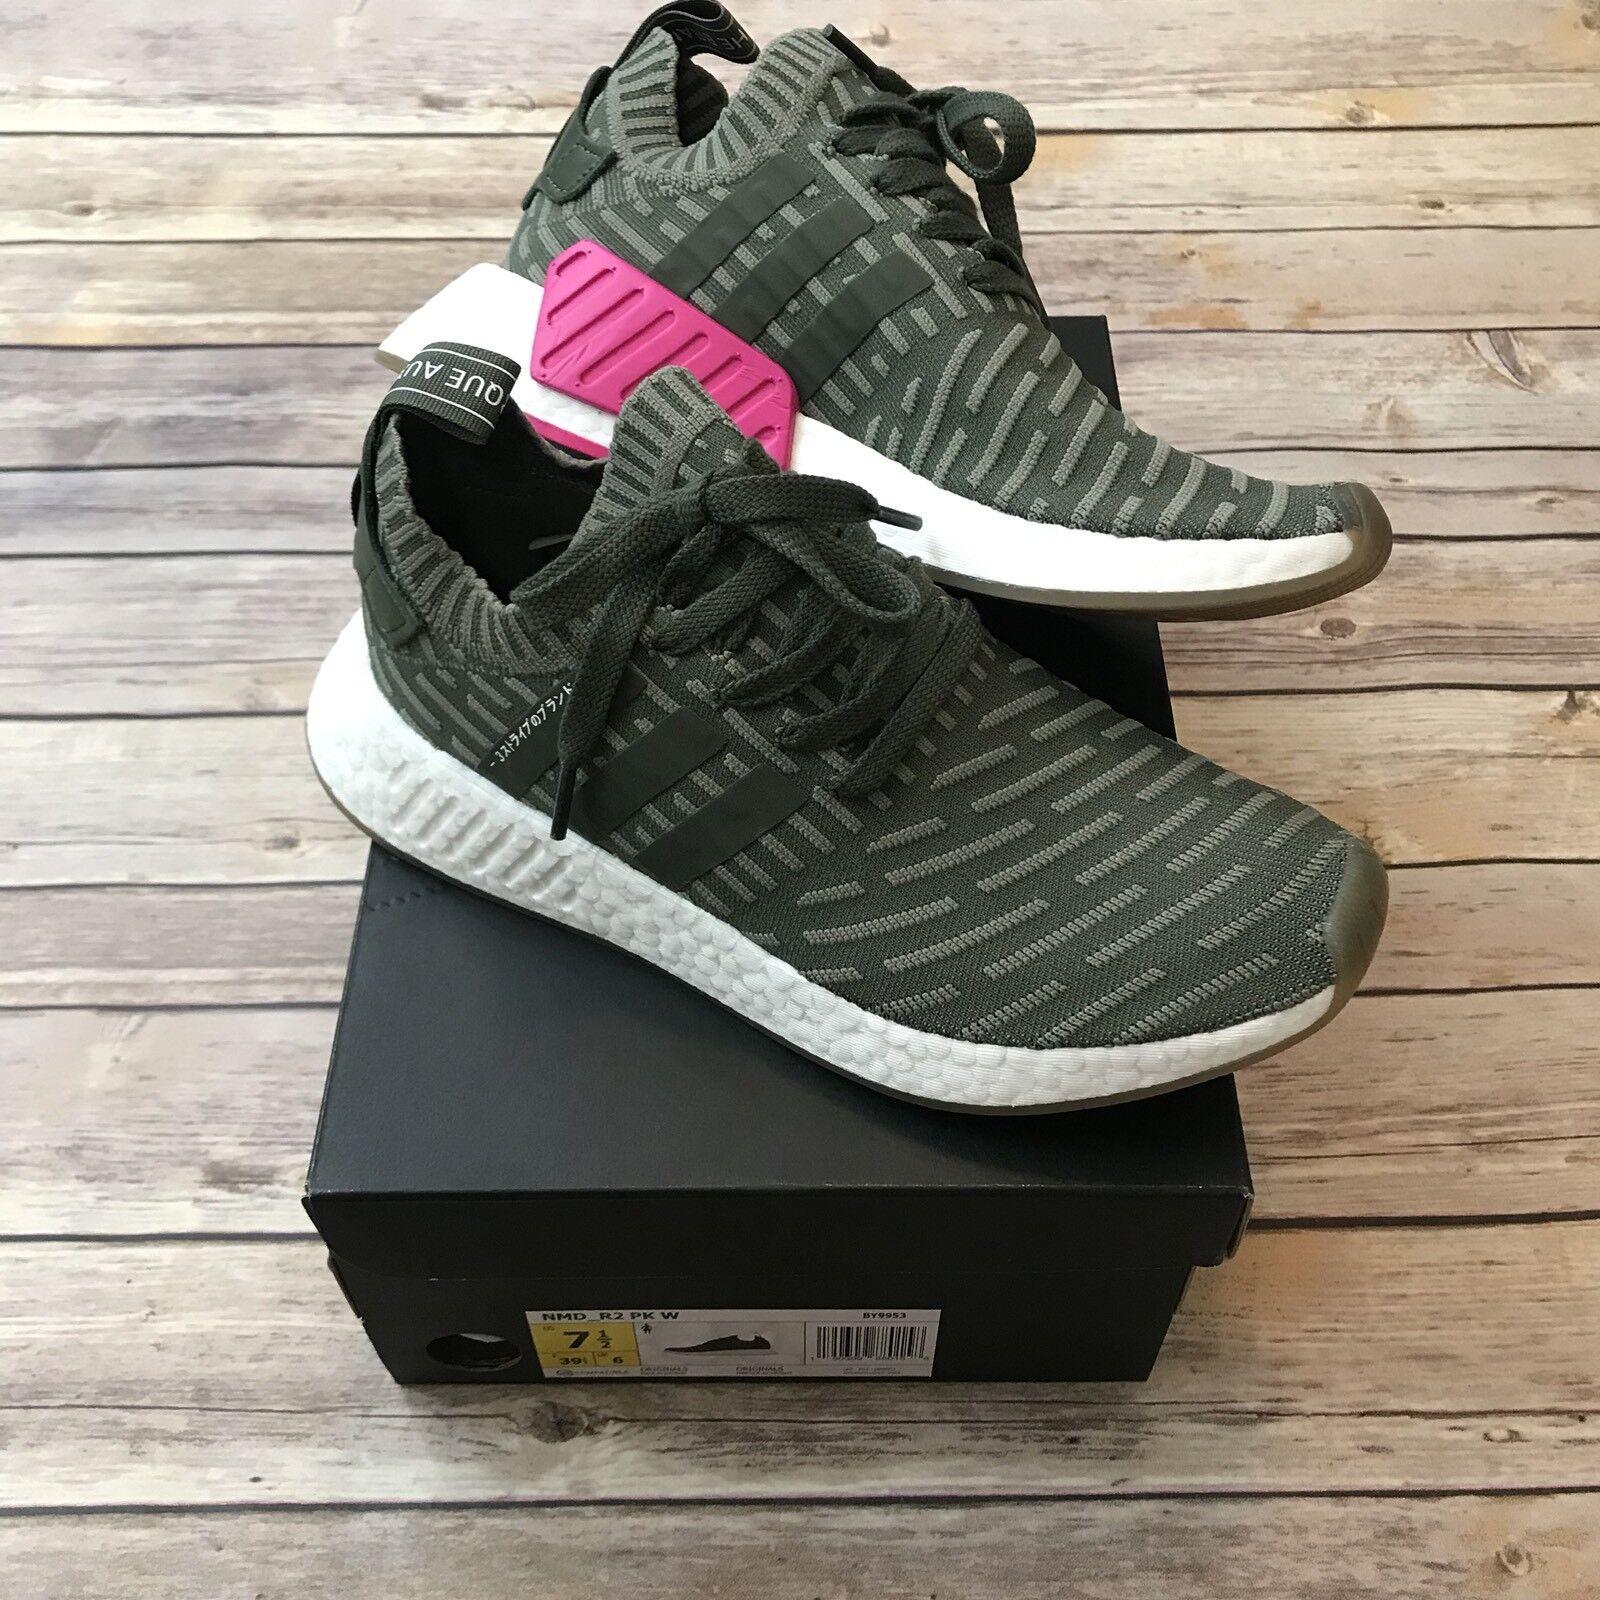 Adidas Sz 7.5 NMD R2 PK W Major, Shock Pink Primekint Sneakers Womens BY9953